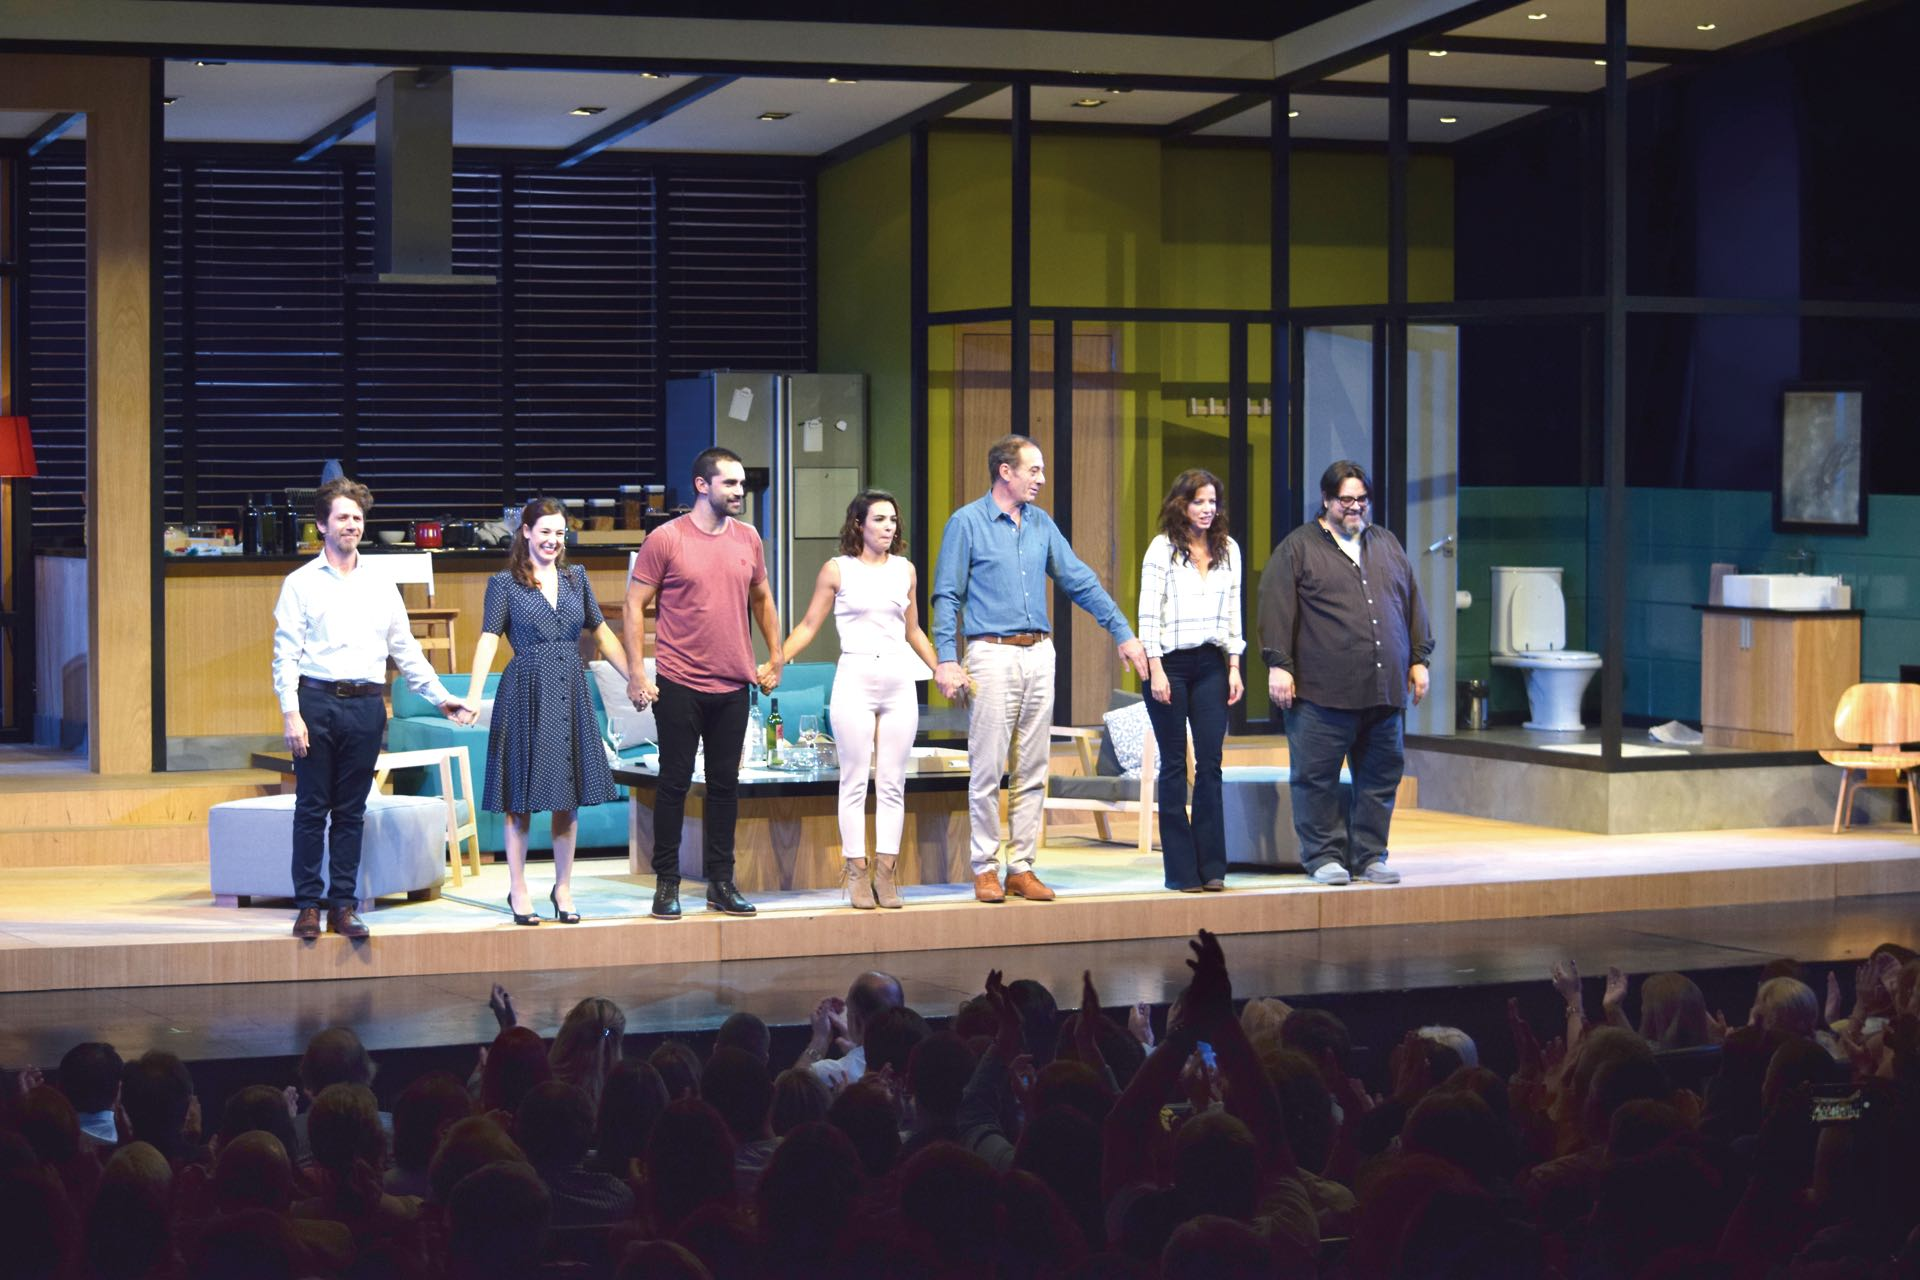 #PARA TI - MERCEDES FUNES - News - Obra de teatro - gentileza - 20180810